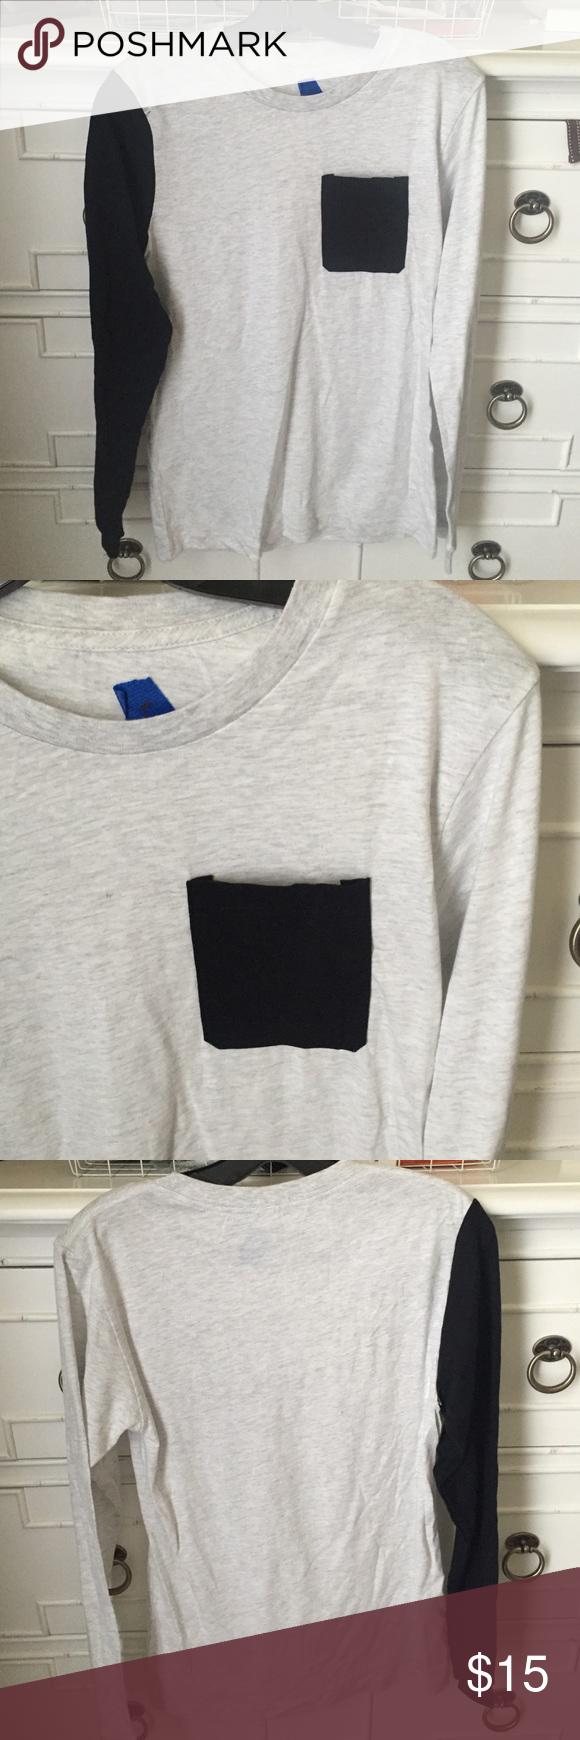 Self made long sleeve shirt New Tops Tees - Long Sleeve